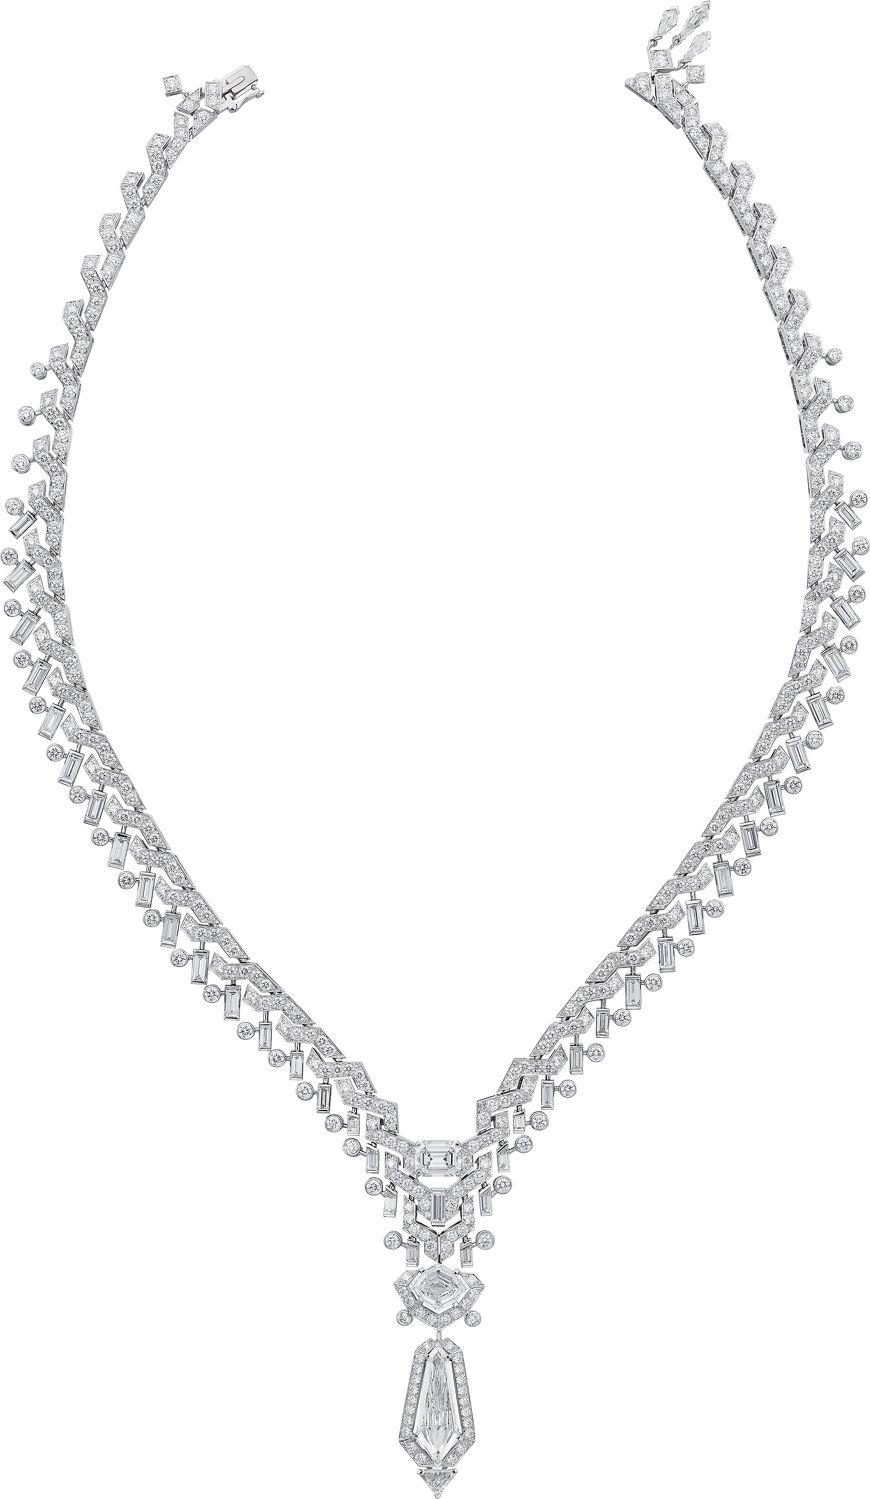 Coruscant necklace - THE EDGE SINGAPORE